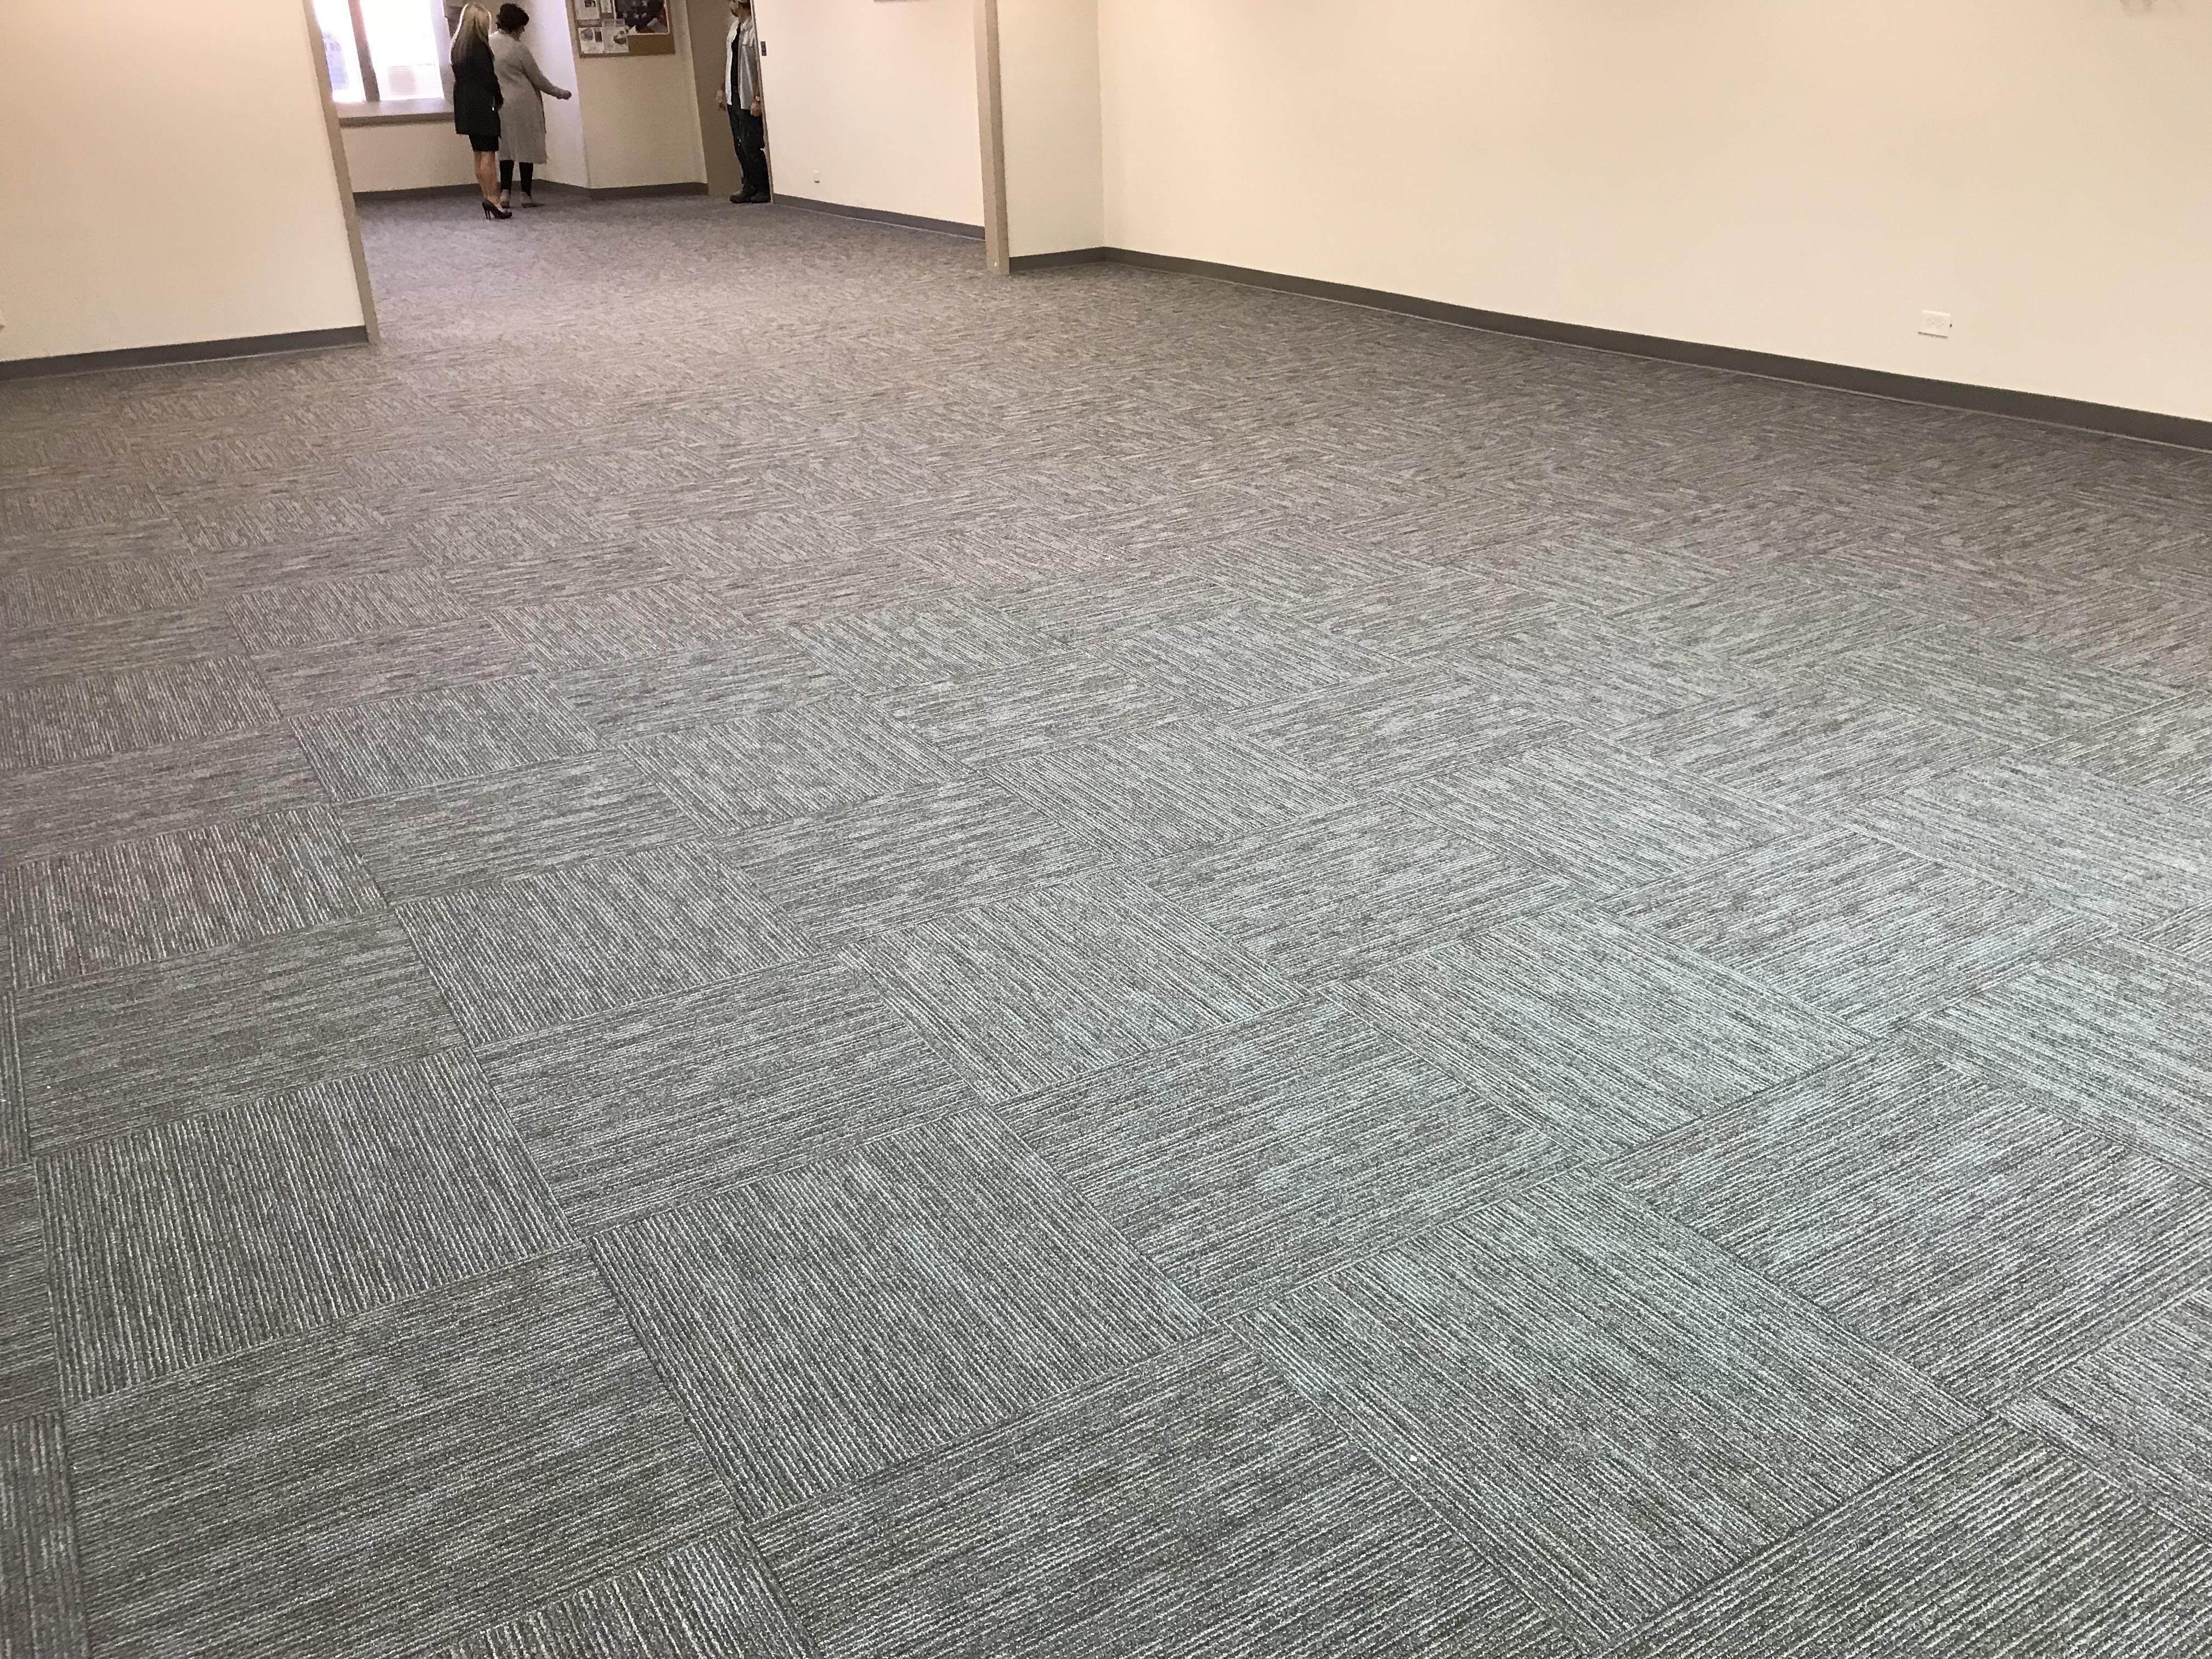 Scharm Donates And Installs New Carpet For The Des Plaines